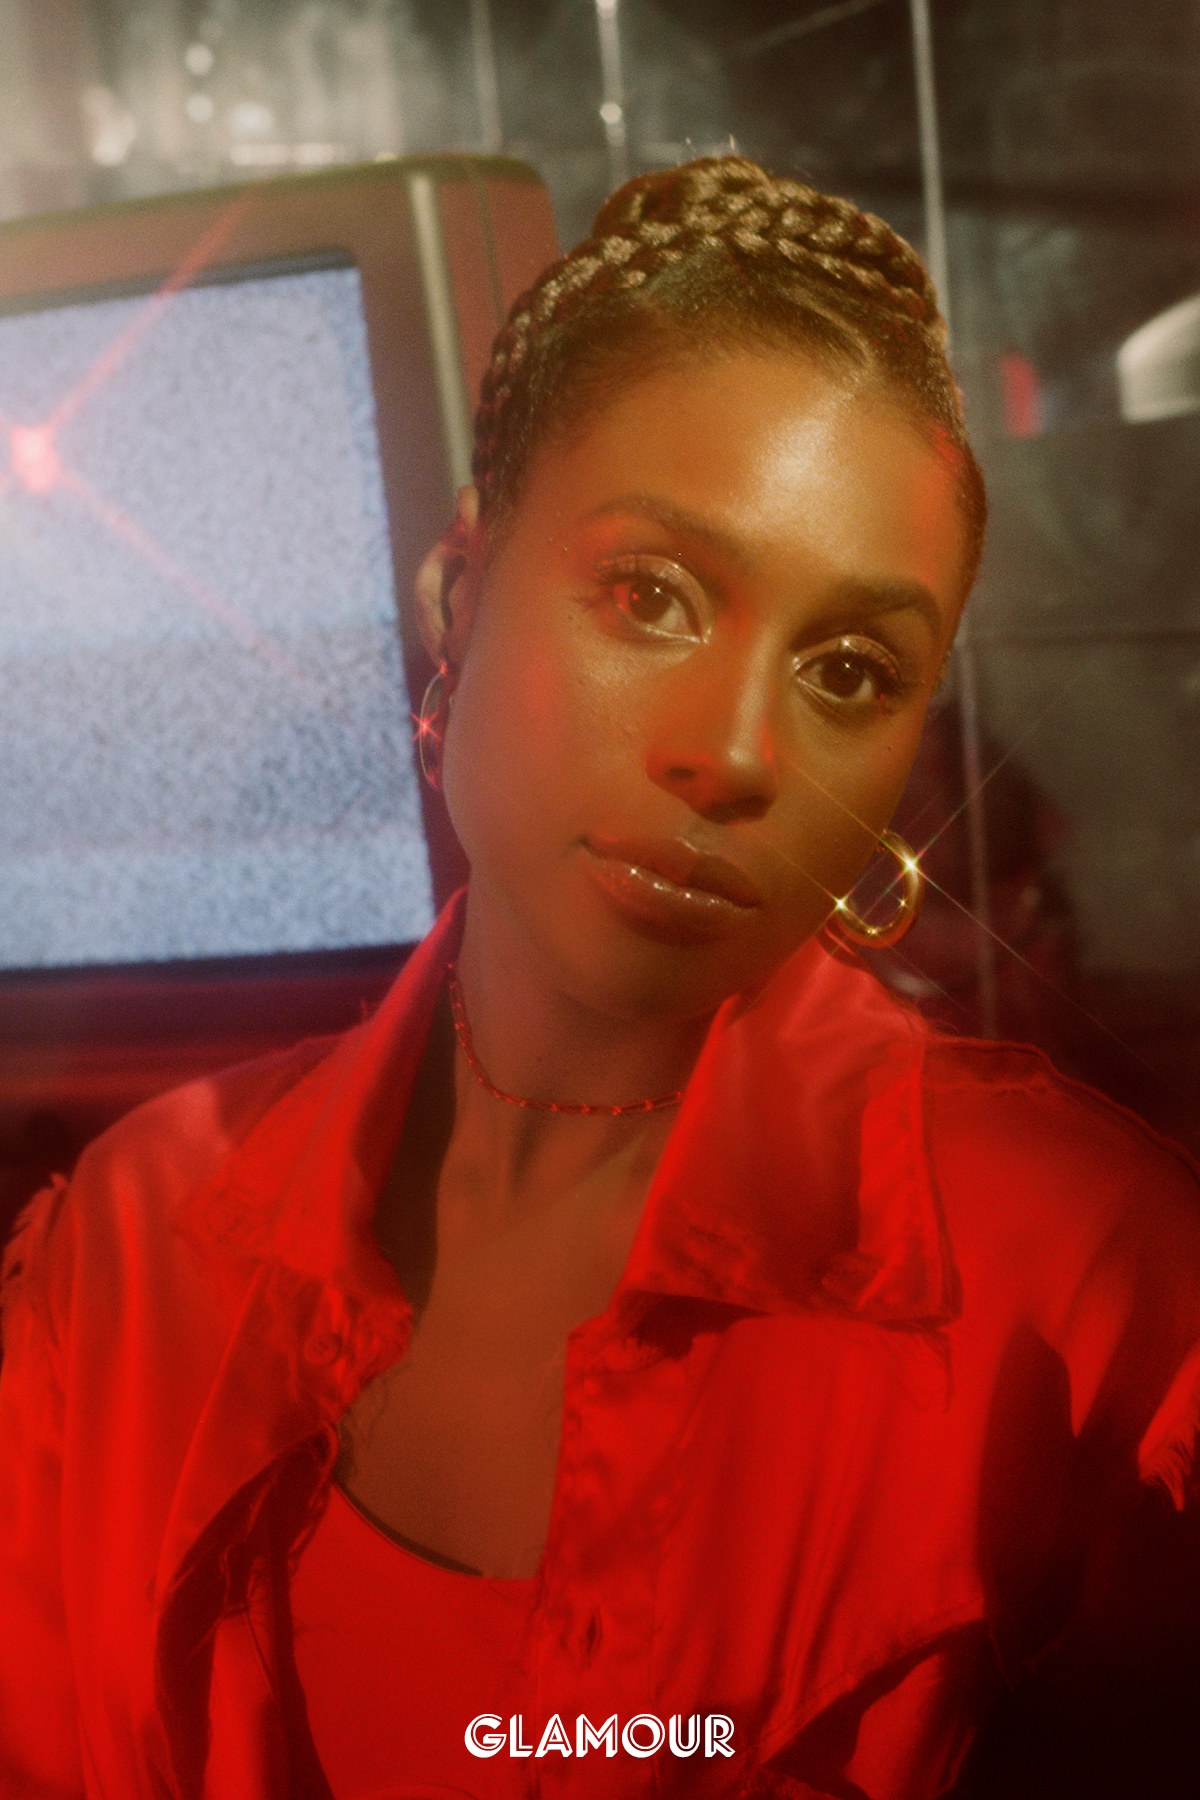 - Telfar blouse, $550. H&M bodysuit, $50. Ventrone Chronicles hoops, $50.